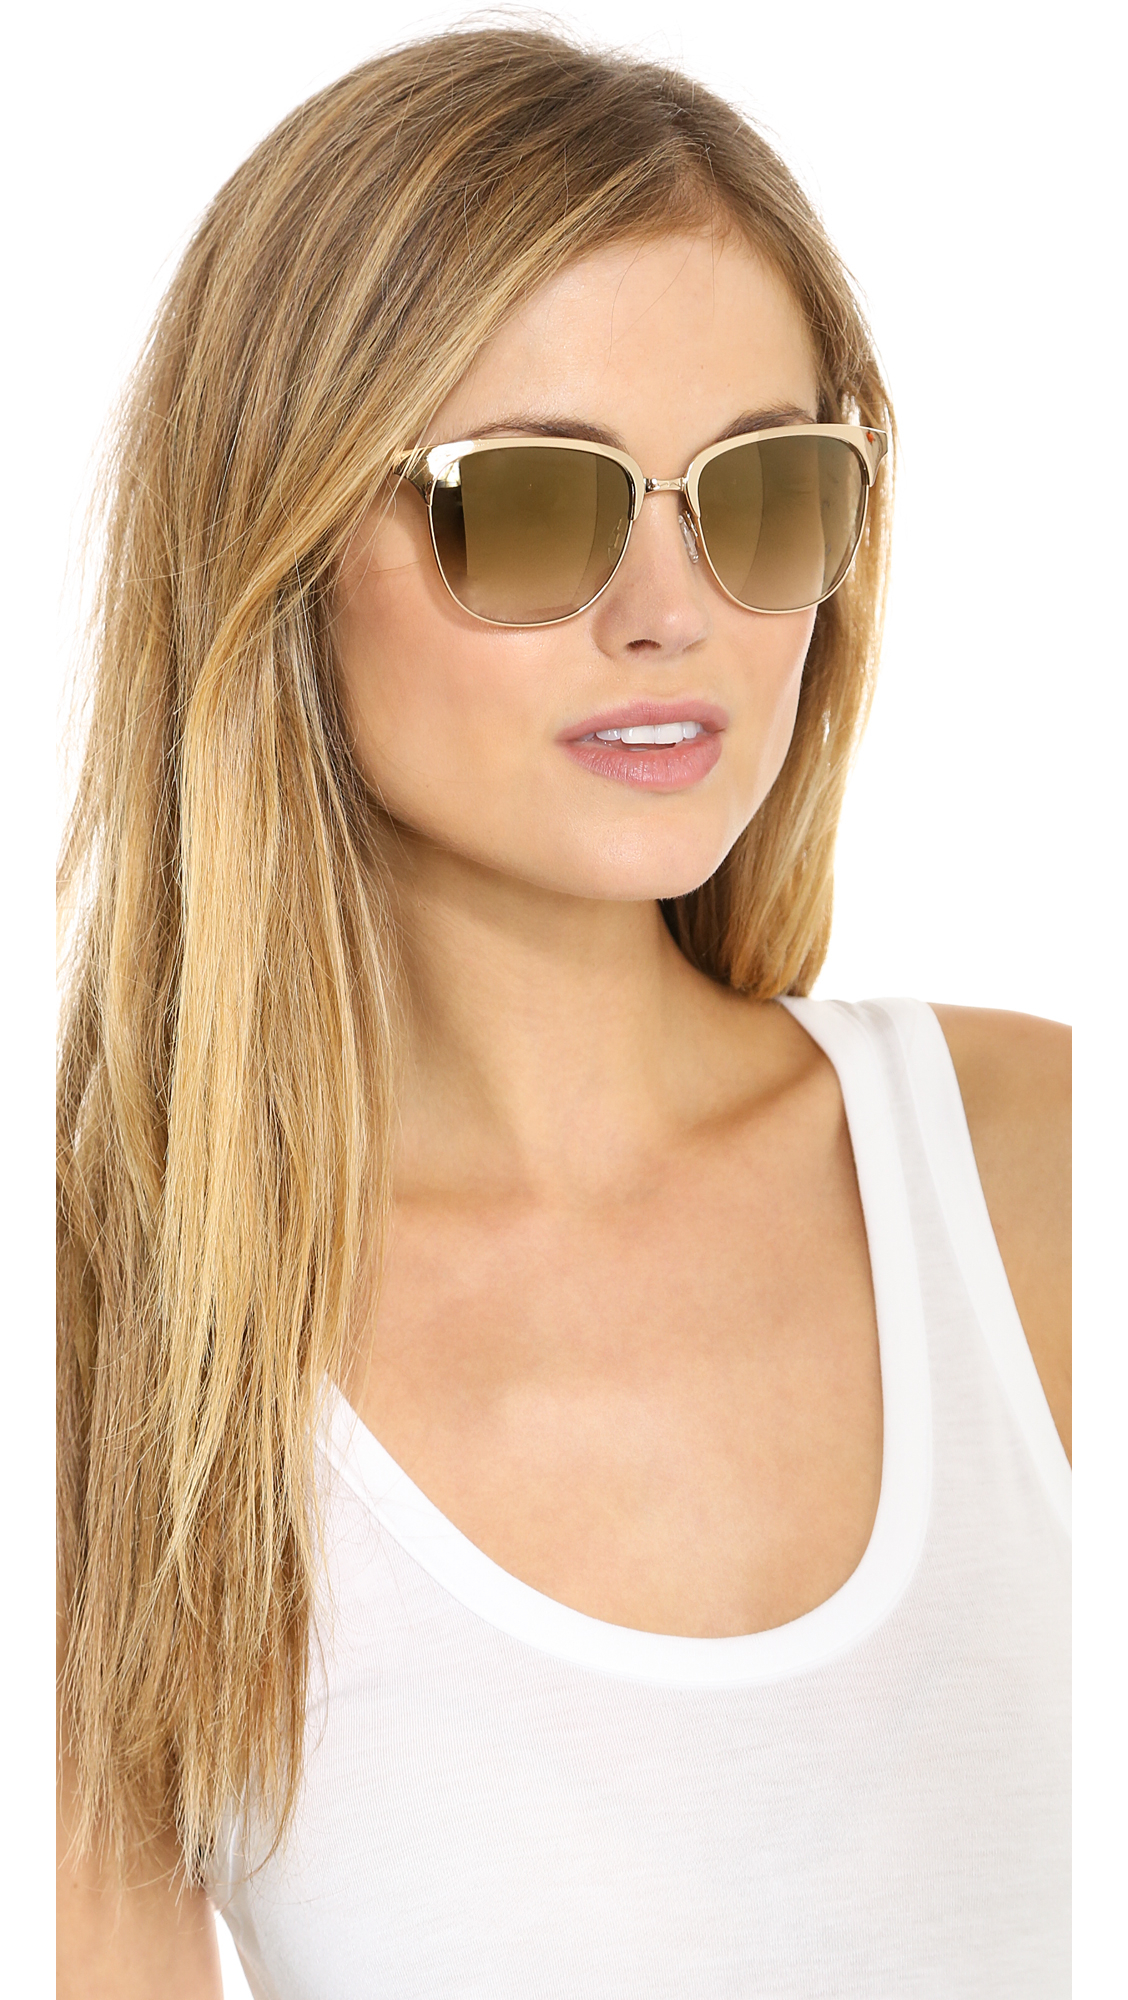 Oliver Peoples Leilana Flash Mirror Sunglasses Crystal